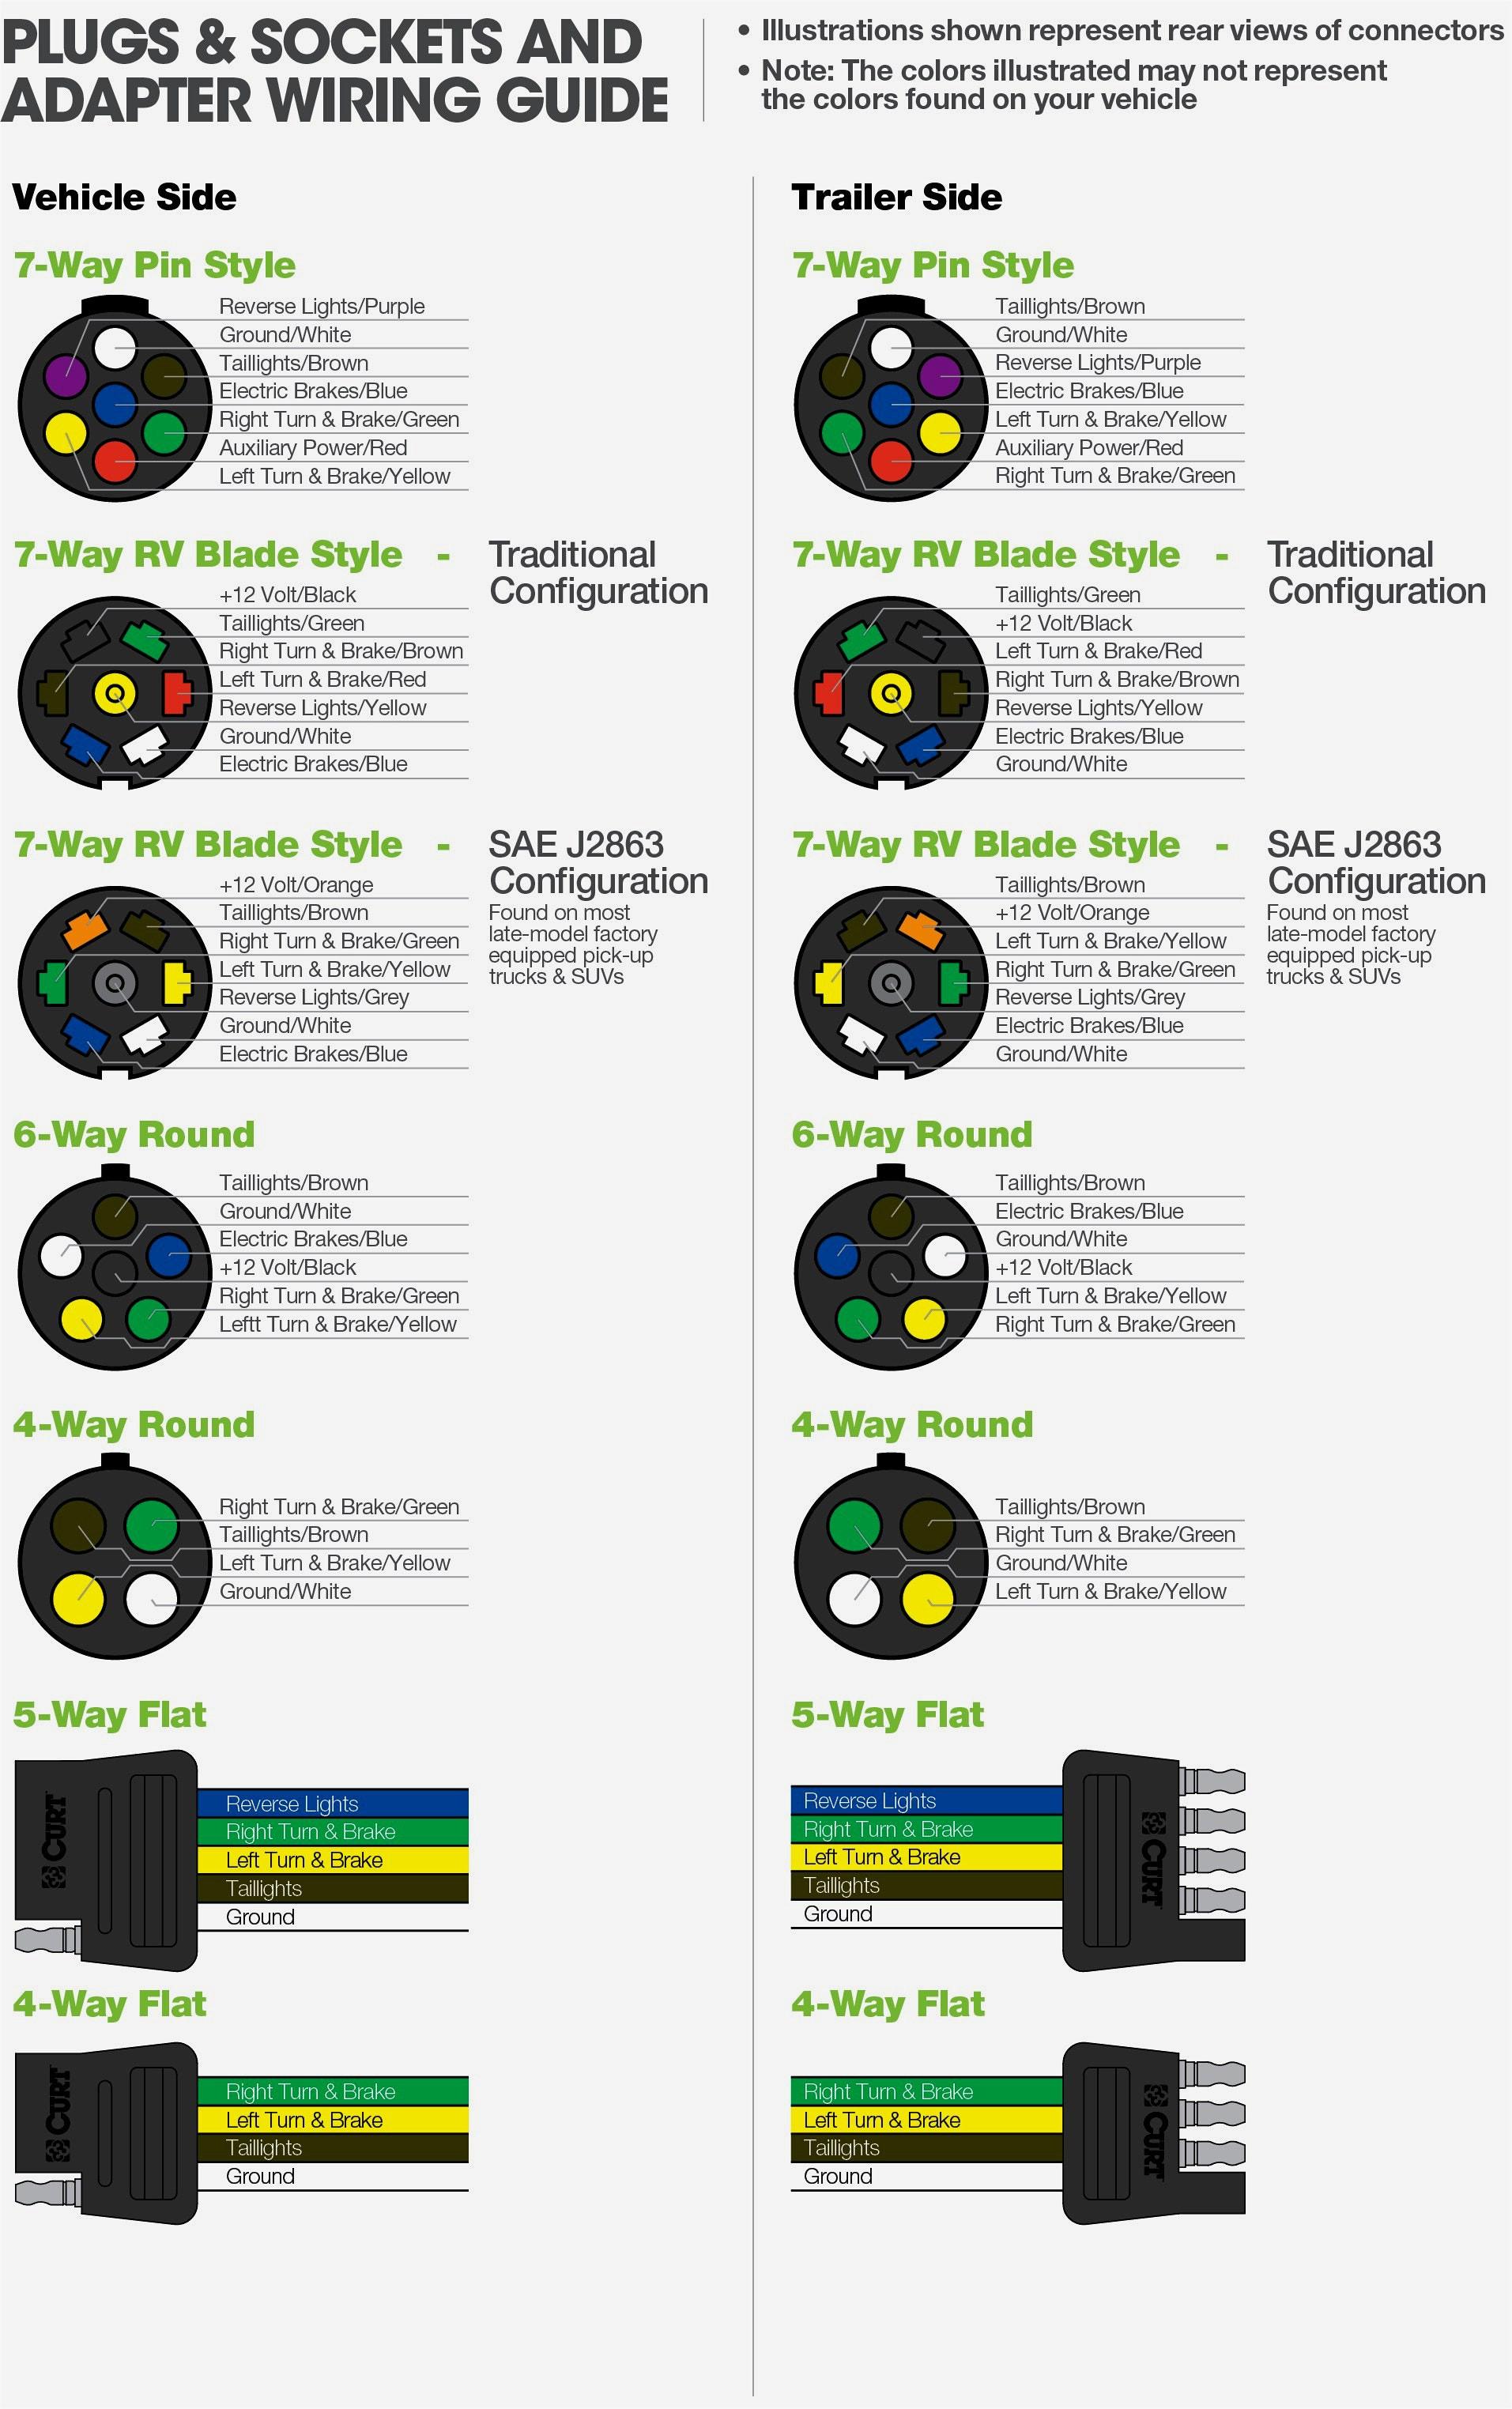 7 Pin Round Trailer Plug Wiring Diagram - Allove - 7 Prong Trailer Plug Wiring Diagram